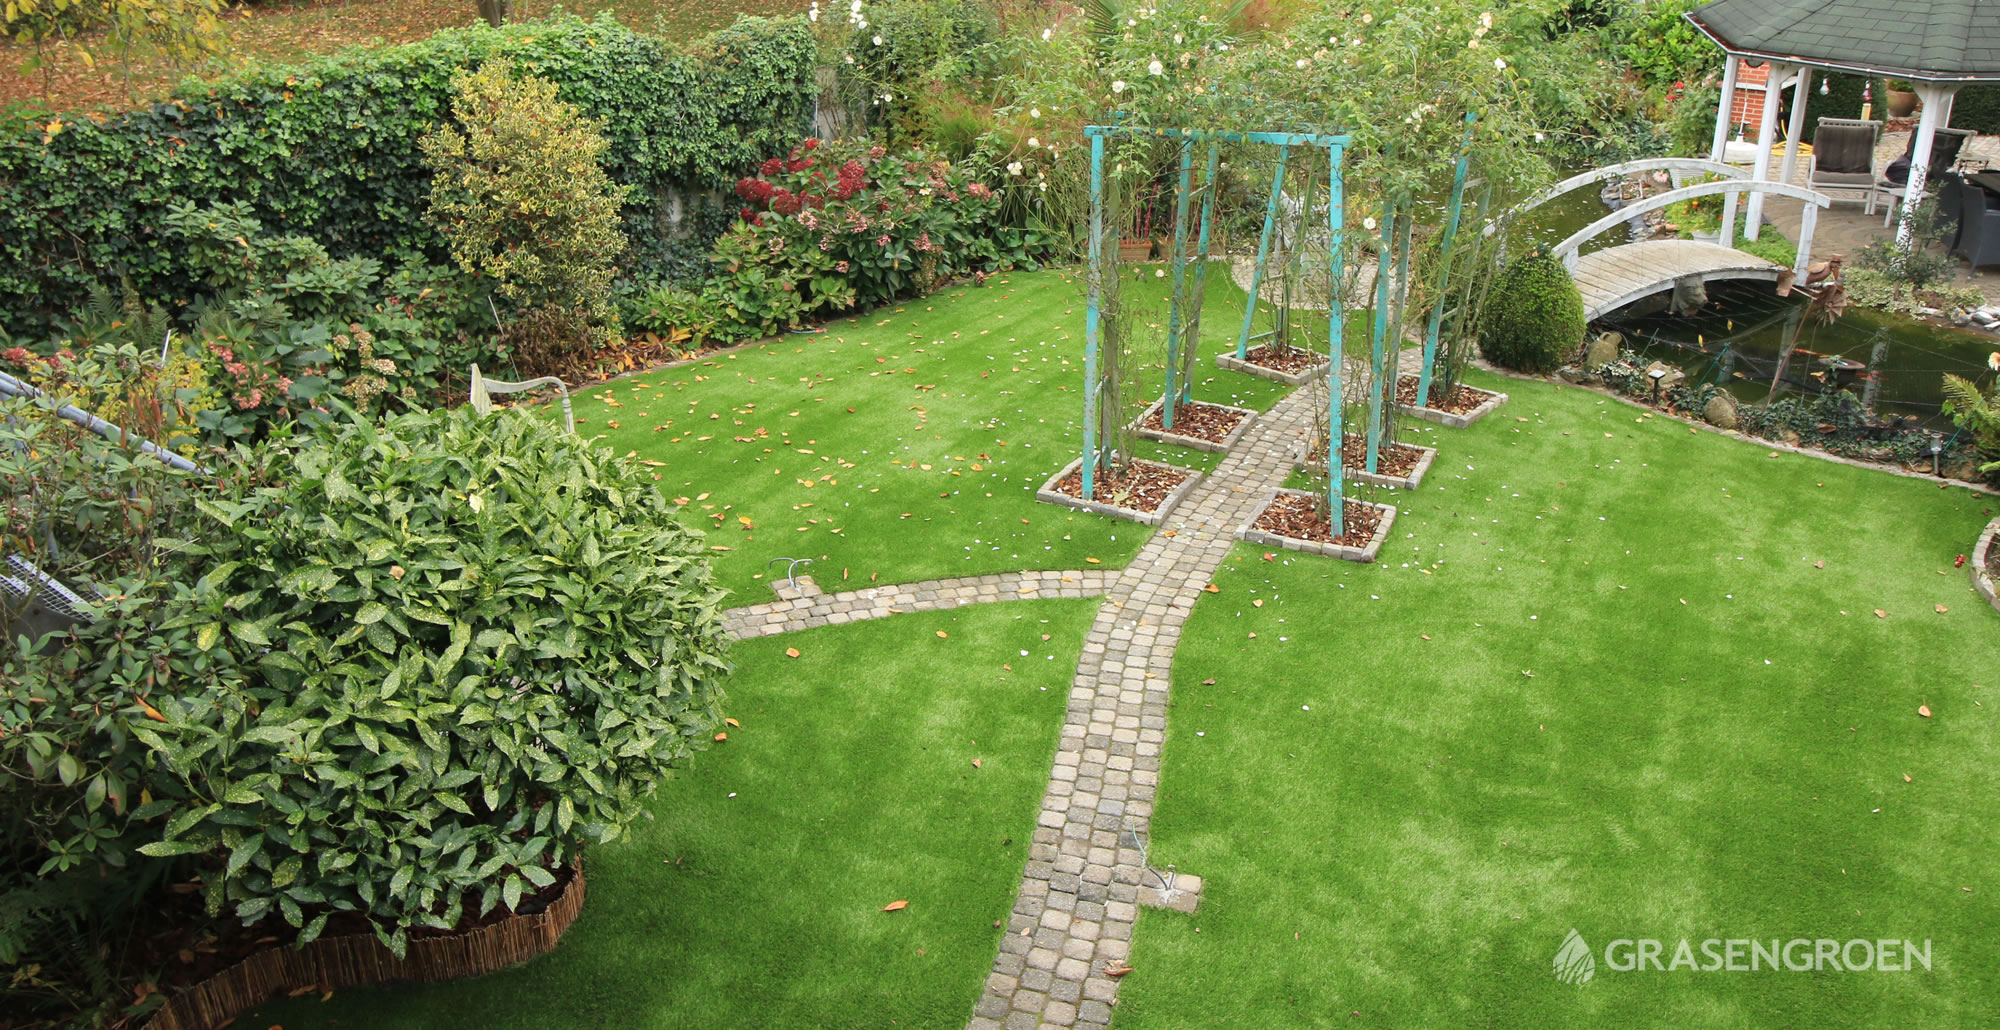 Kunstgrasleggensintjoriswinge17 • Gras en Groen Kunstgras